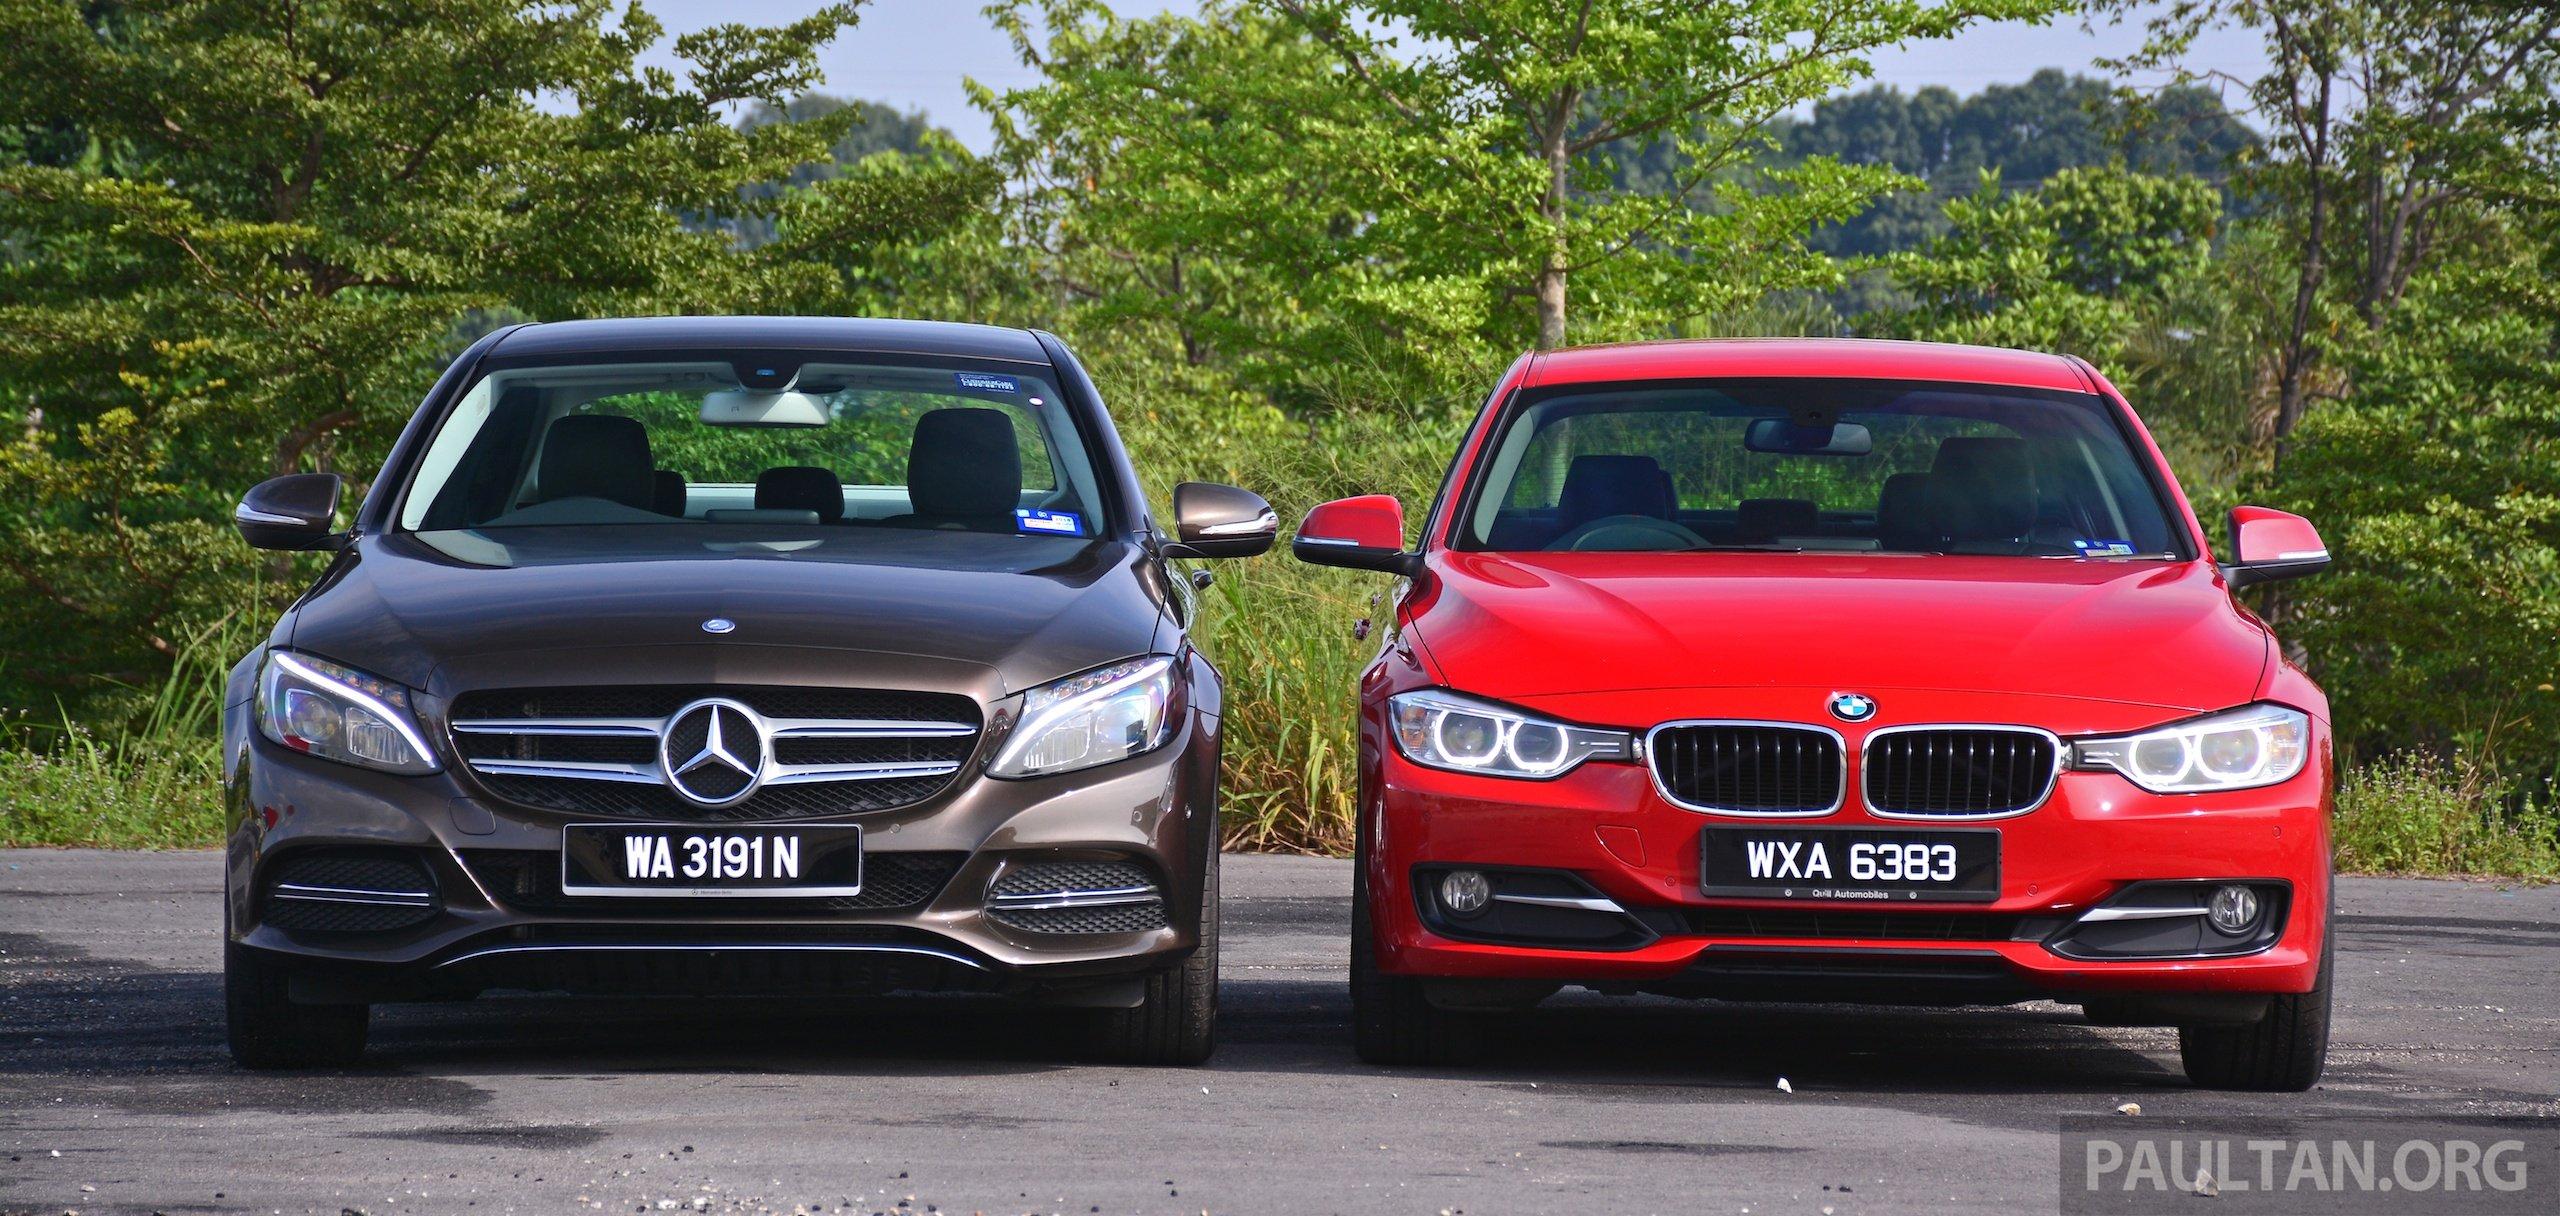 Comparison between mercedes benz c class and bmw 3 series for Mercedes benz s class vs bmw 7 series